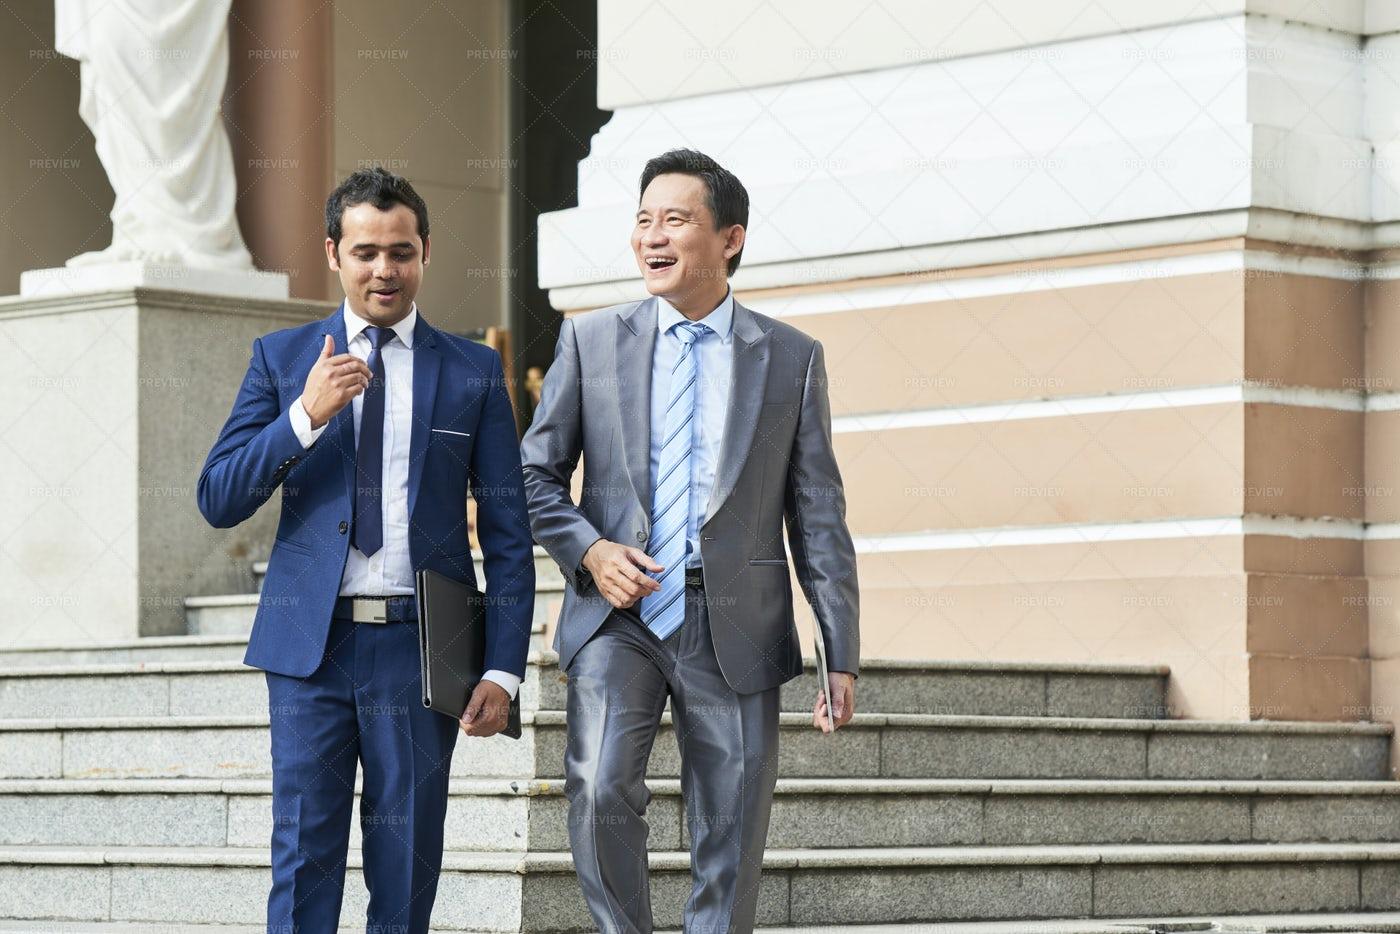 Businessmen Leaving Office Building: Stock Photos